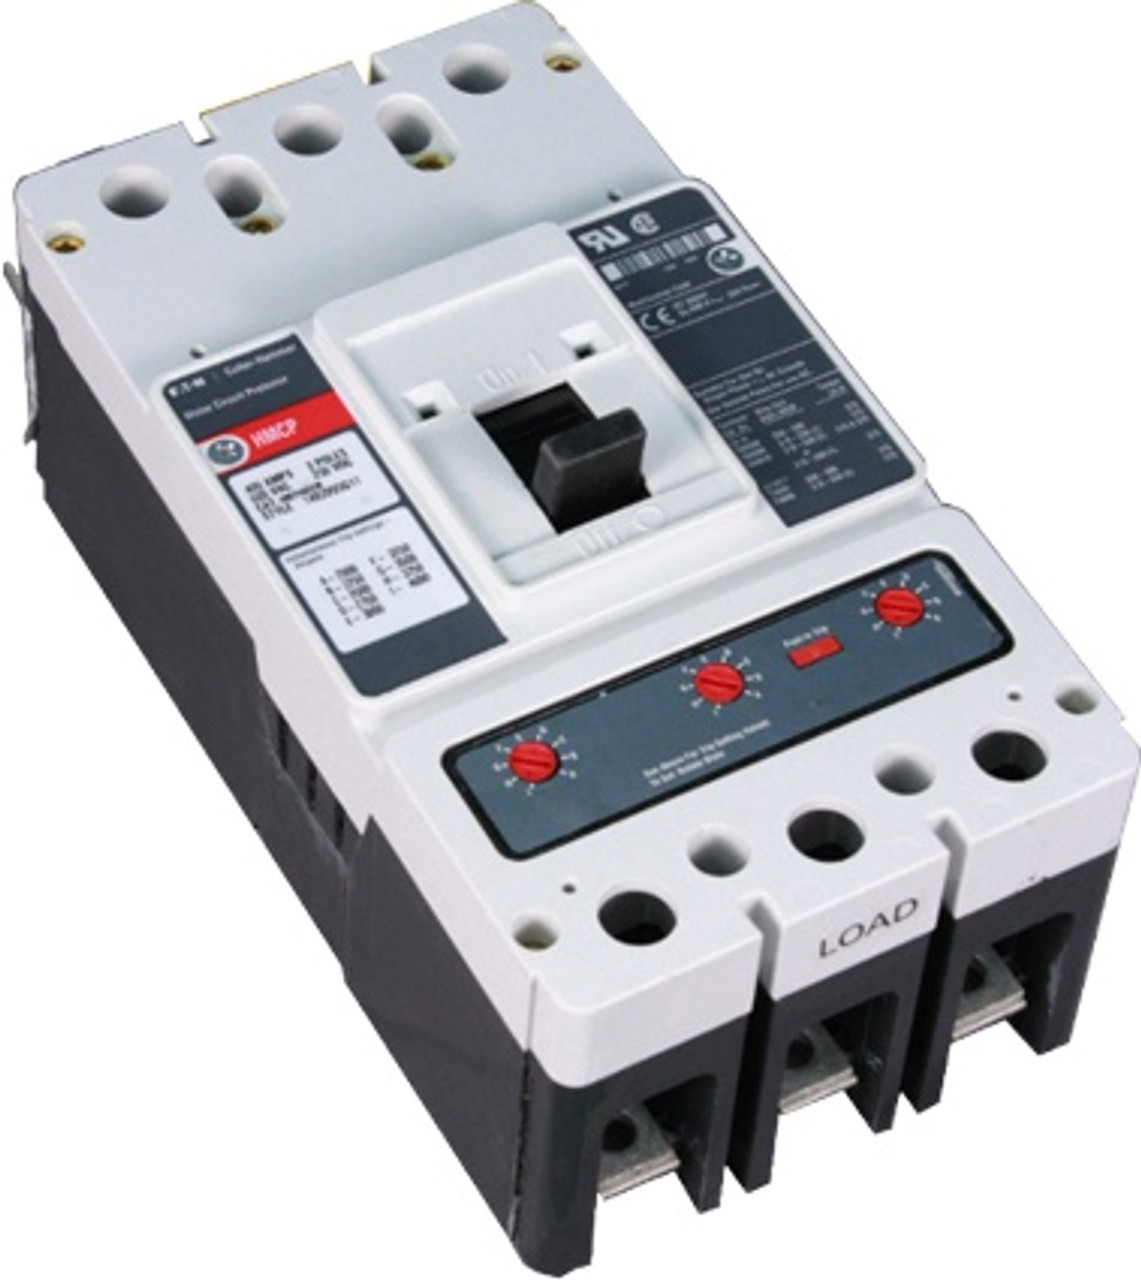 HMCP400F5 Motor Circuit Protector